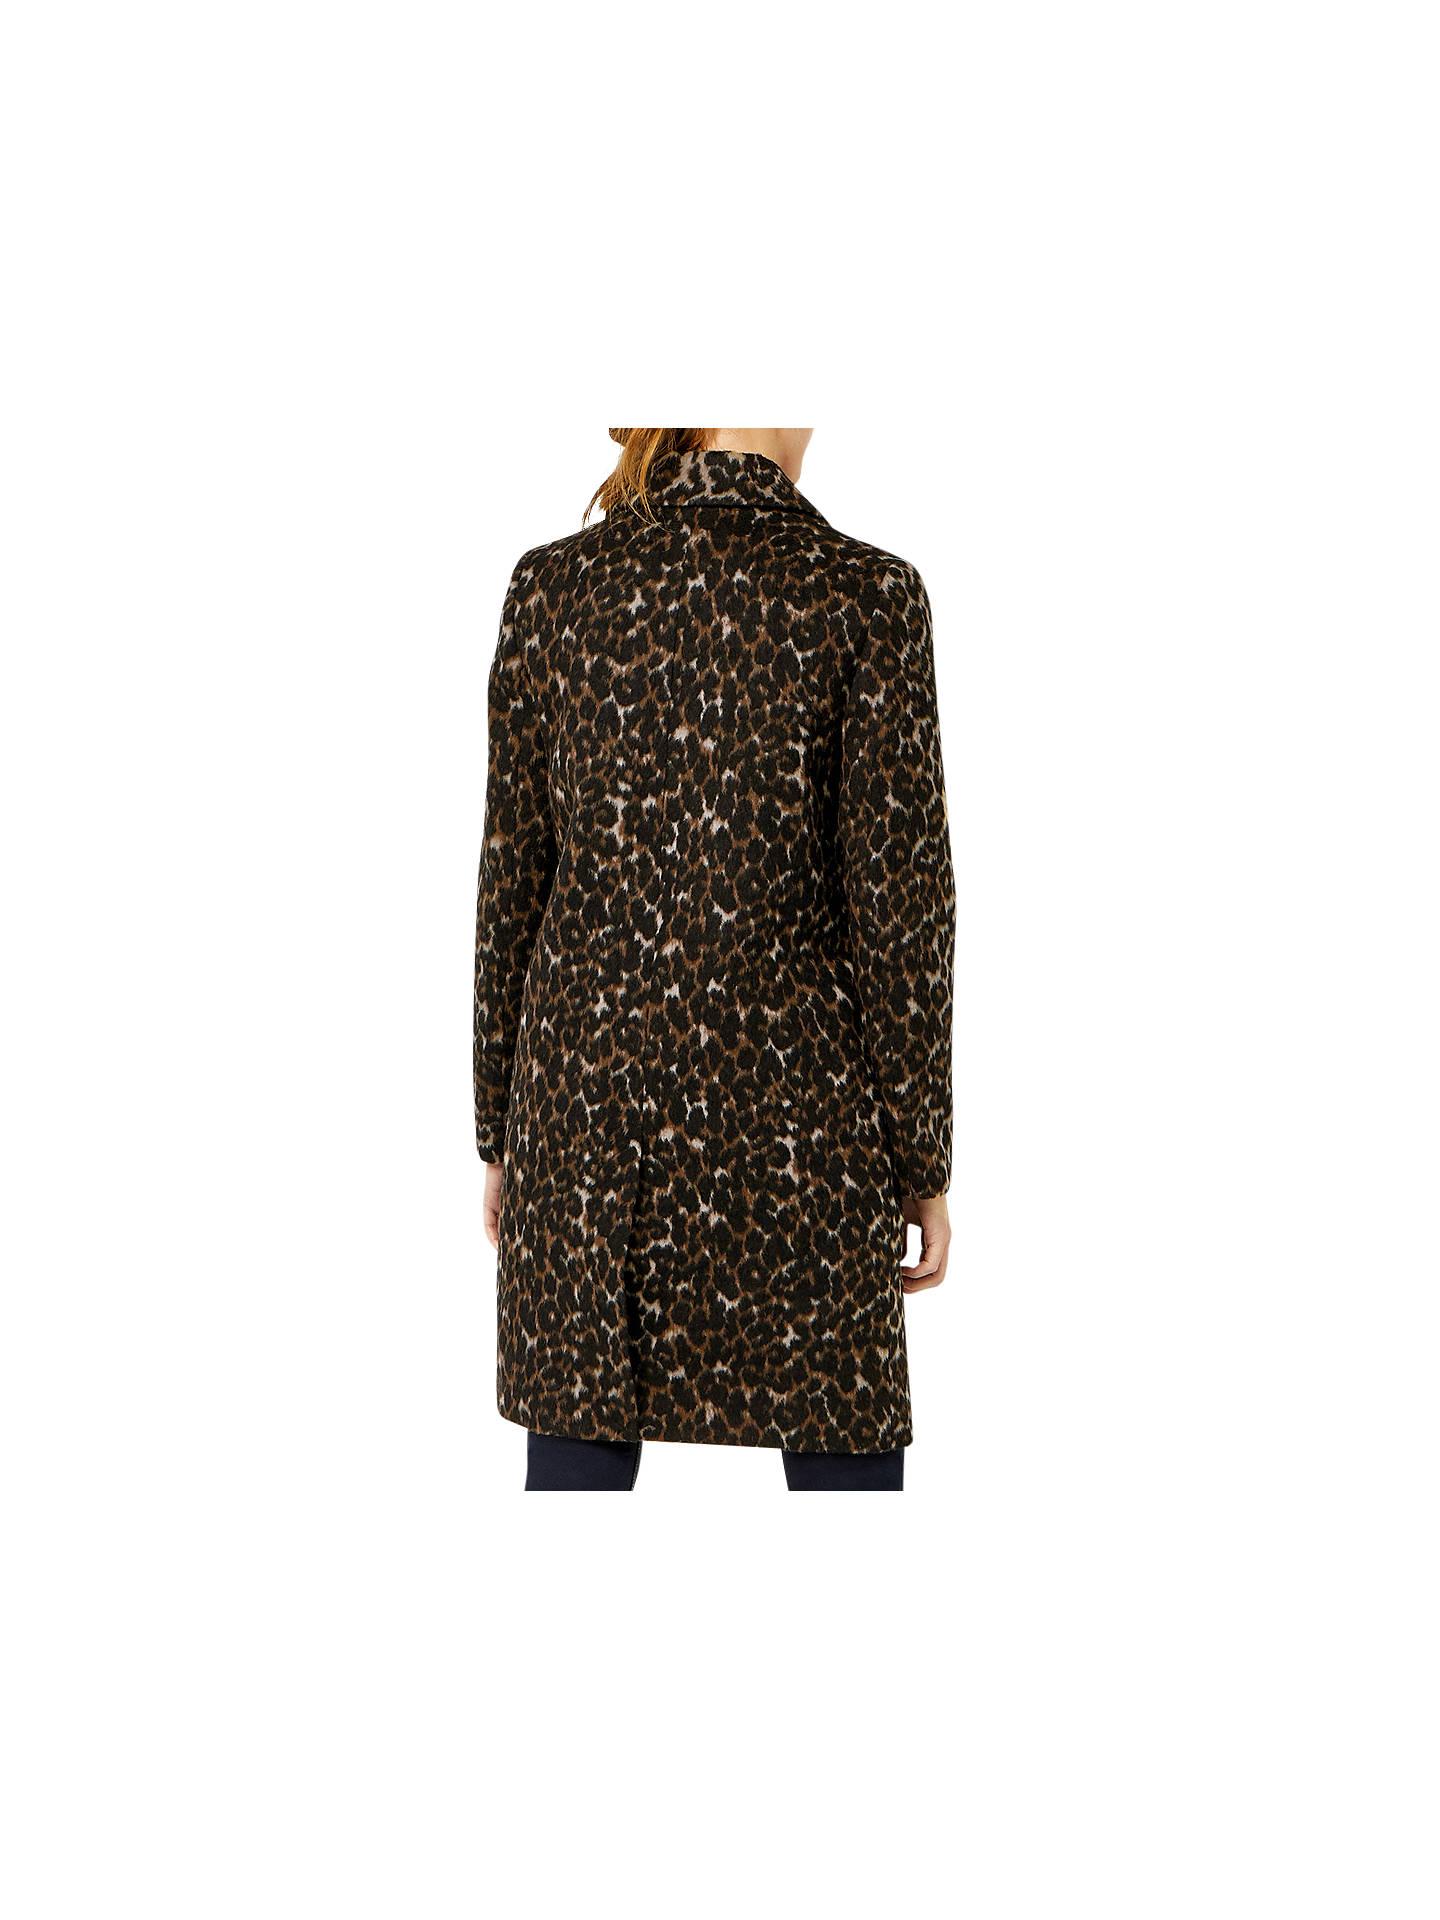 da95ce28f114 ... Buy Warehouse Animal Print Coat, Multi, 6 Online at johnlewis.com ...